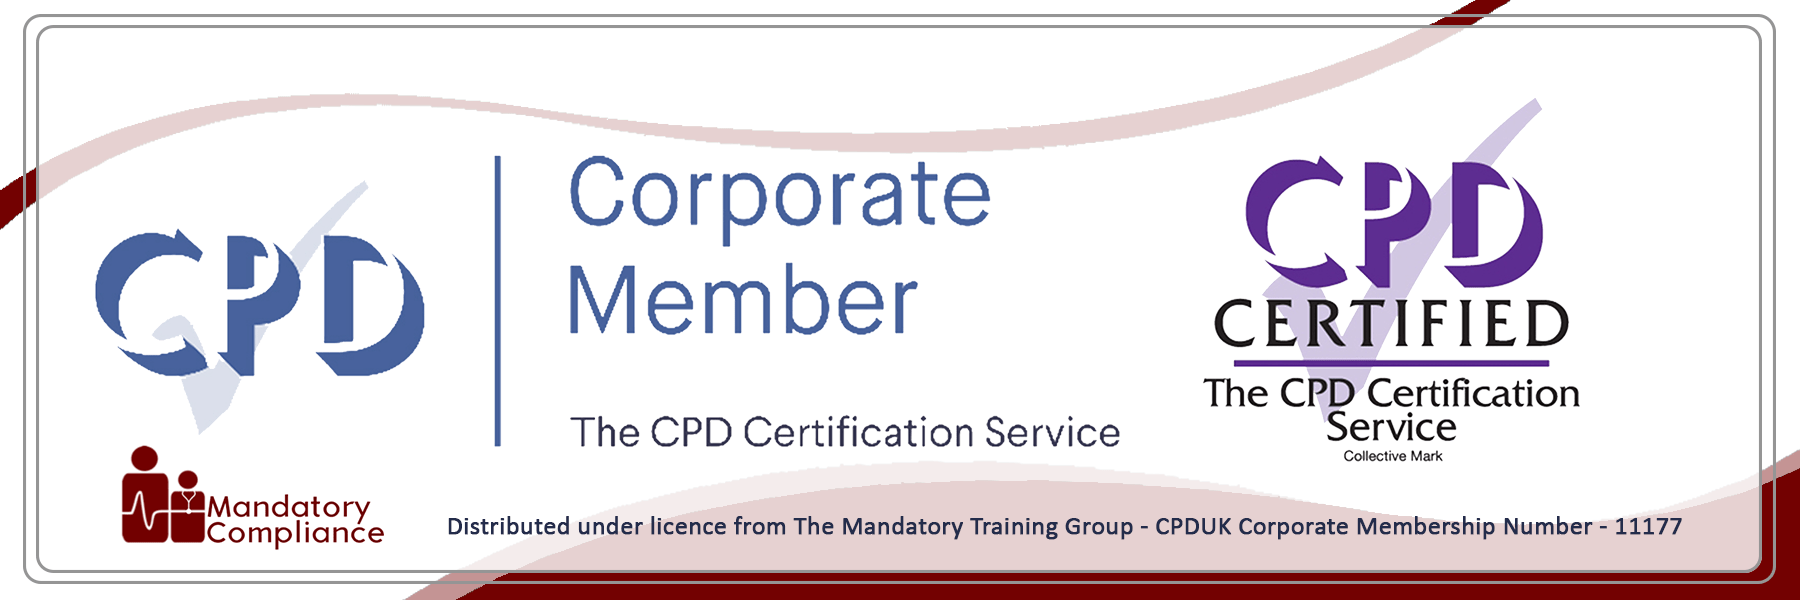 Documentation and Recordkeeping - Online Training Courses - Mandatory Compliance UK-